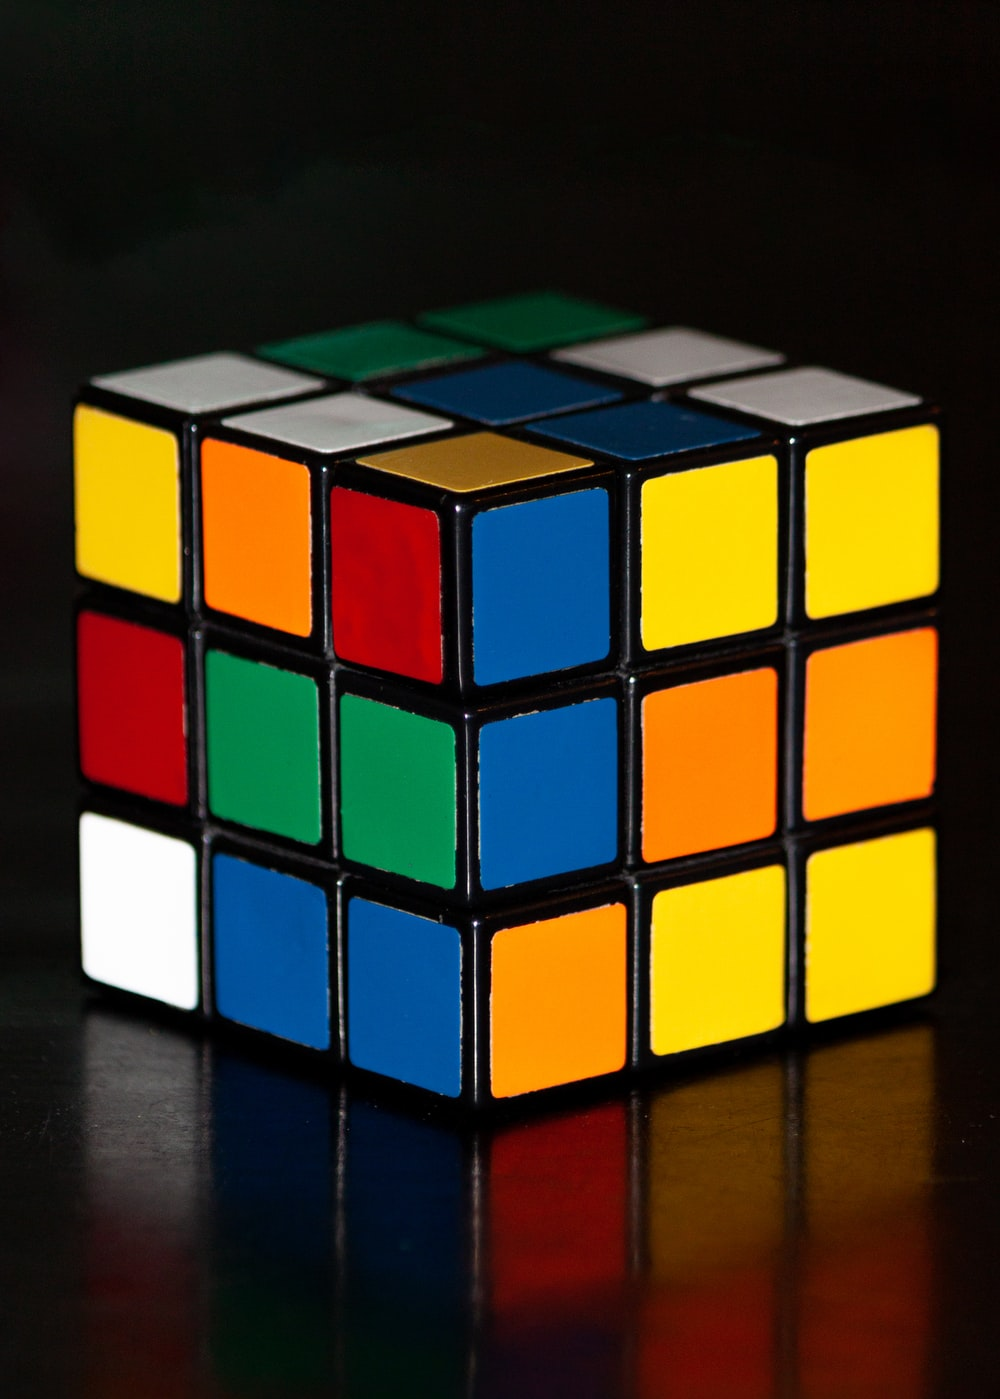 3 x 3 Rubik's Cube on black surface